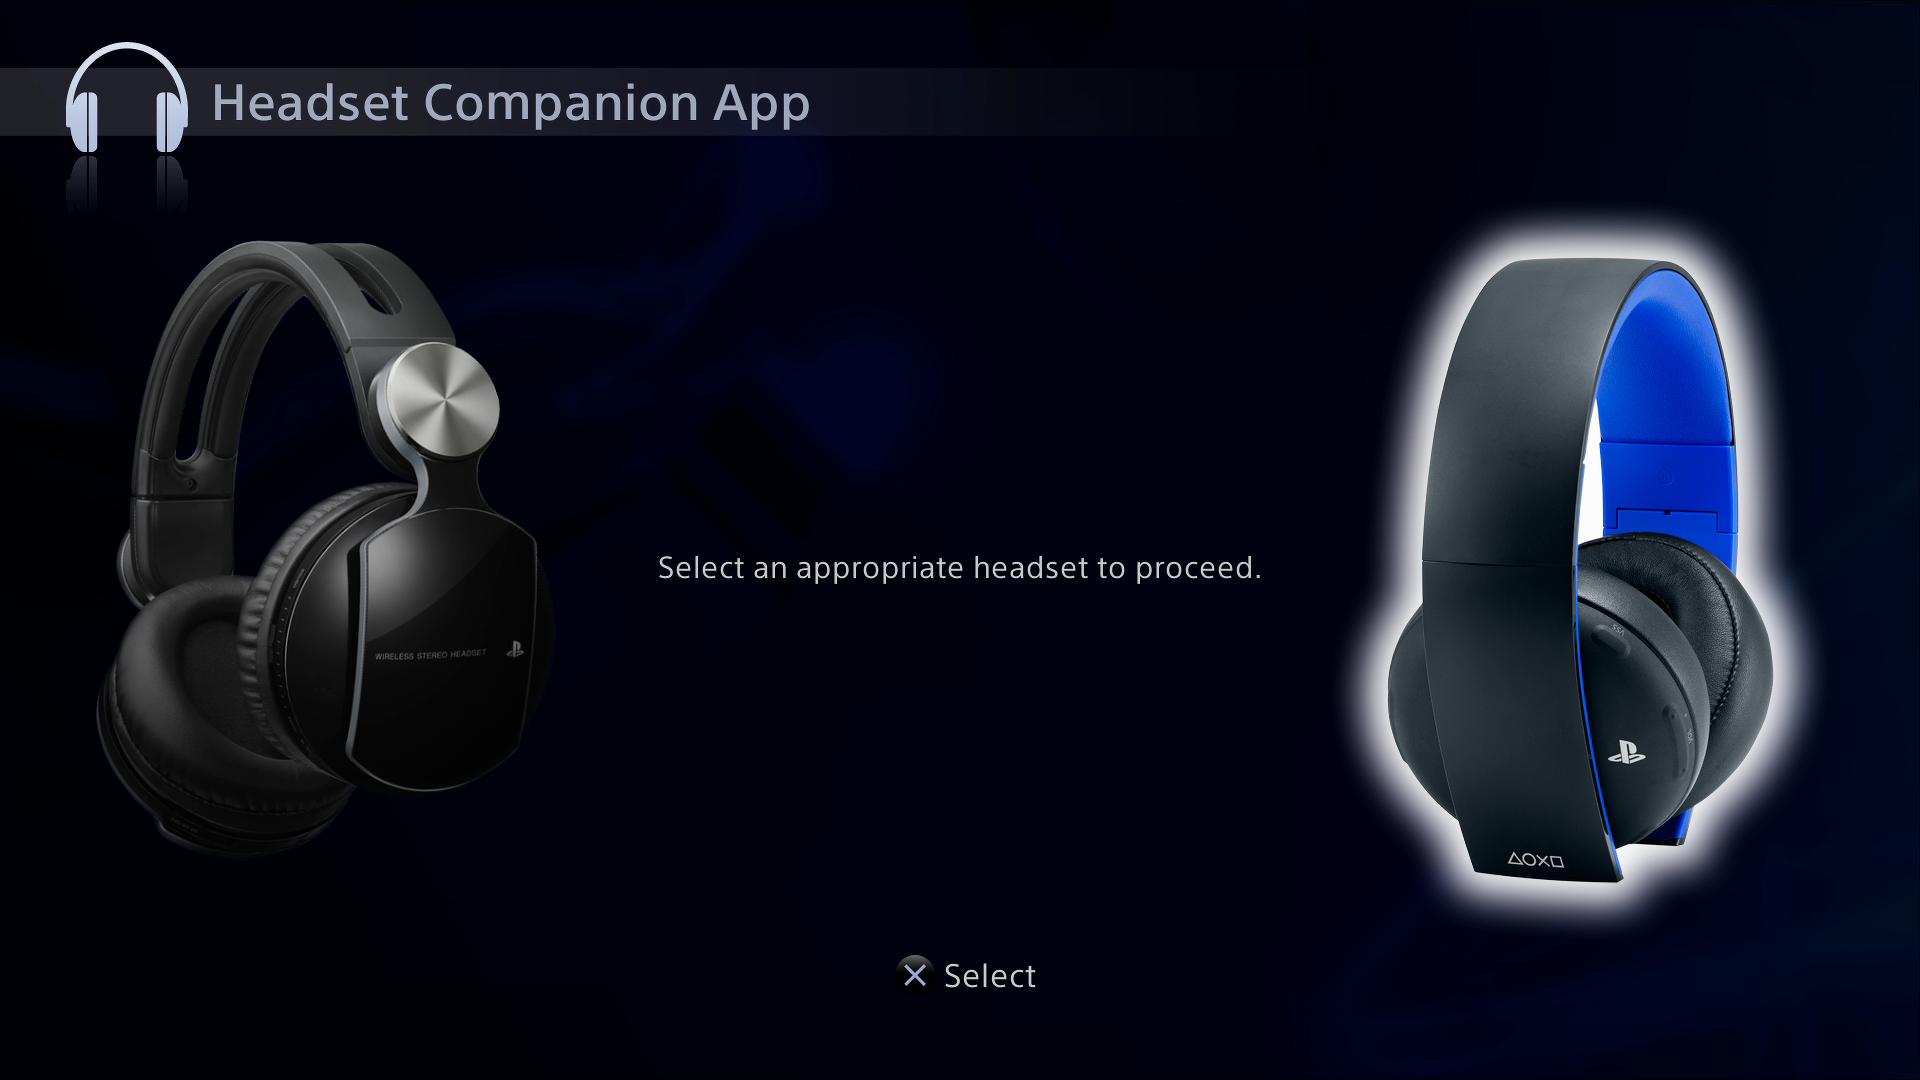 Hardware: Sony Gold Wireless Stereo Headset 9455